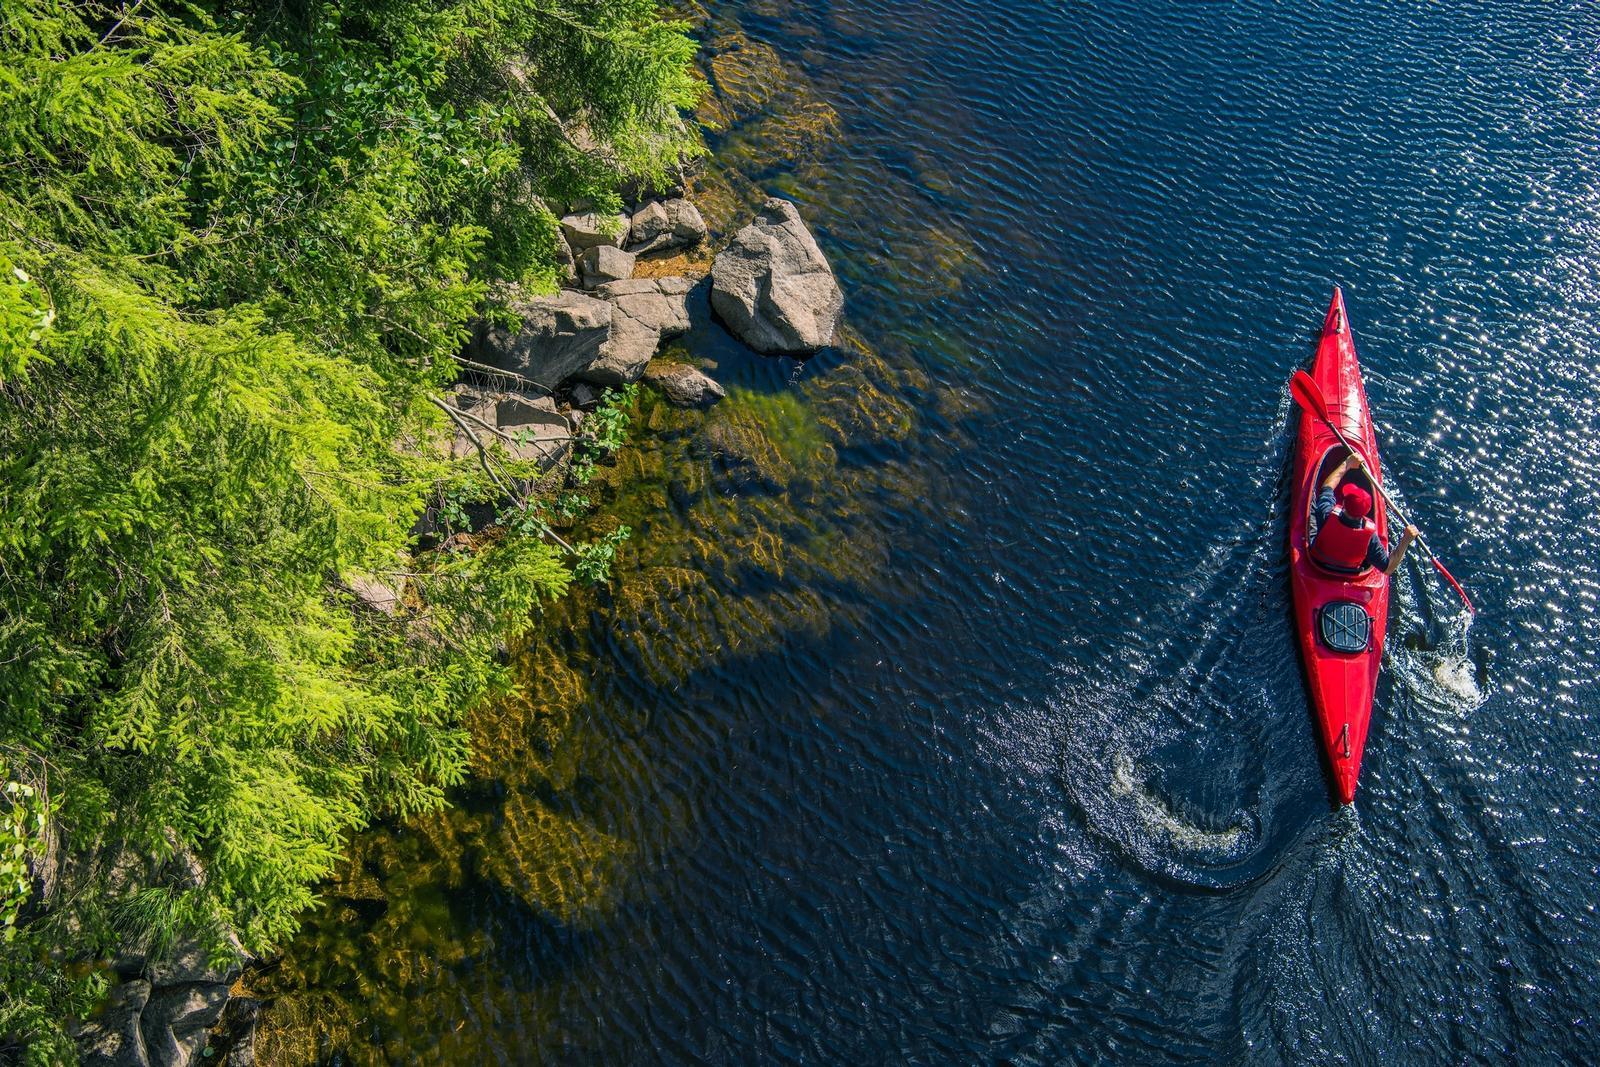 viaggi organizzati kayak canoa e rafting